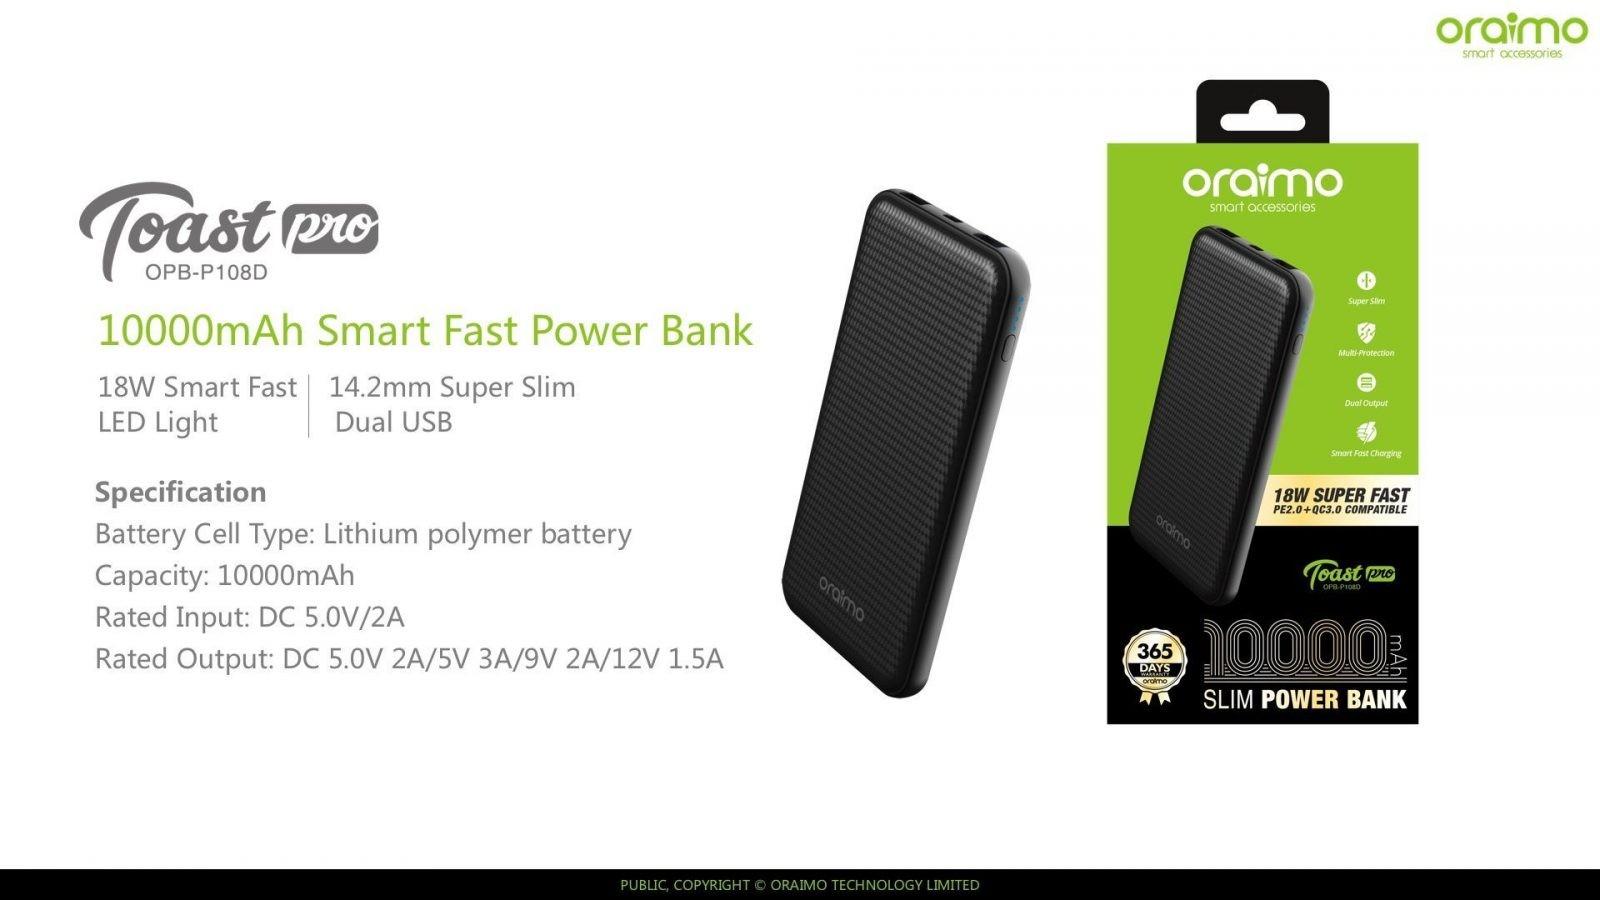 Oraimo Opb P108d Toast Pro 10000mah Smart Fast Charging Power Bank (11)